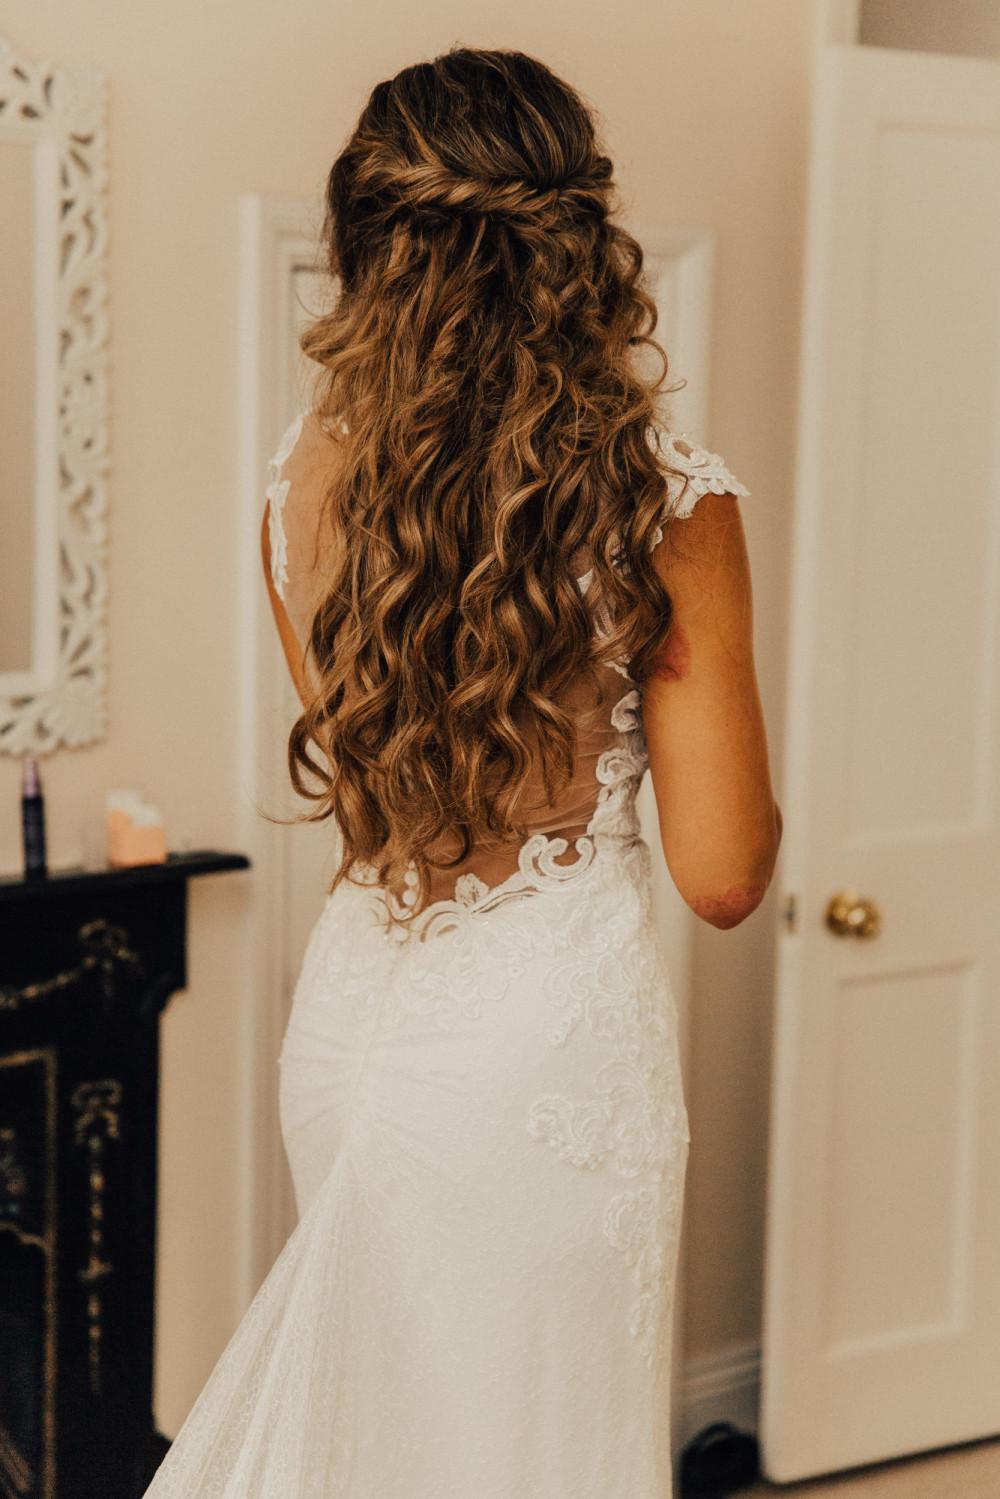 A beautiful shot of Freya in her dress showing her amazing bohemian waves. - Make Me Bridal Artist: Hair Design by Lisa. Photography by: The Wild Bride. #bohemian #boho #halfuphair #curls #weddingmorning #gettingready #bridalhair #rustic #brunette #tousled #weddinghair #bridalhairstylist #wavyhair